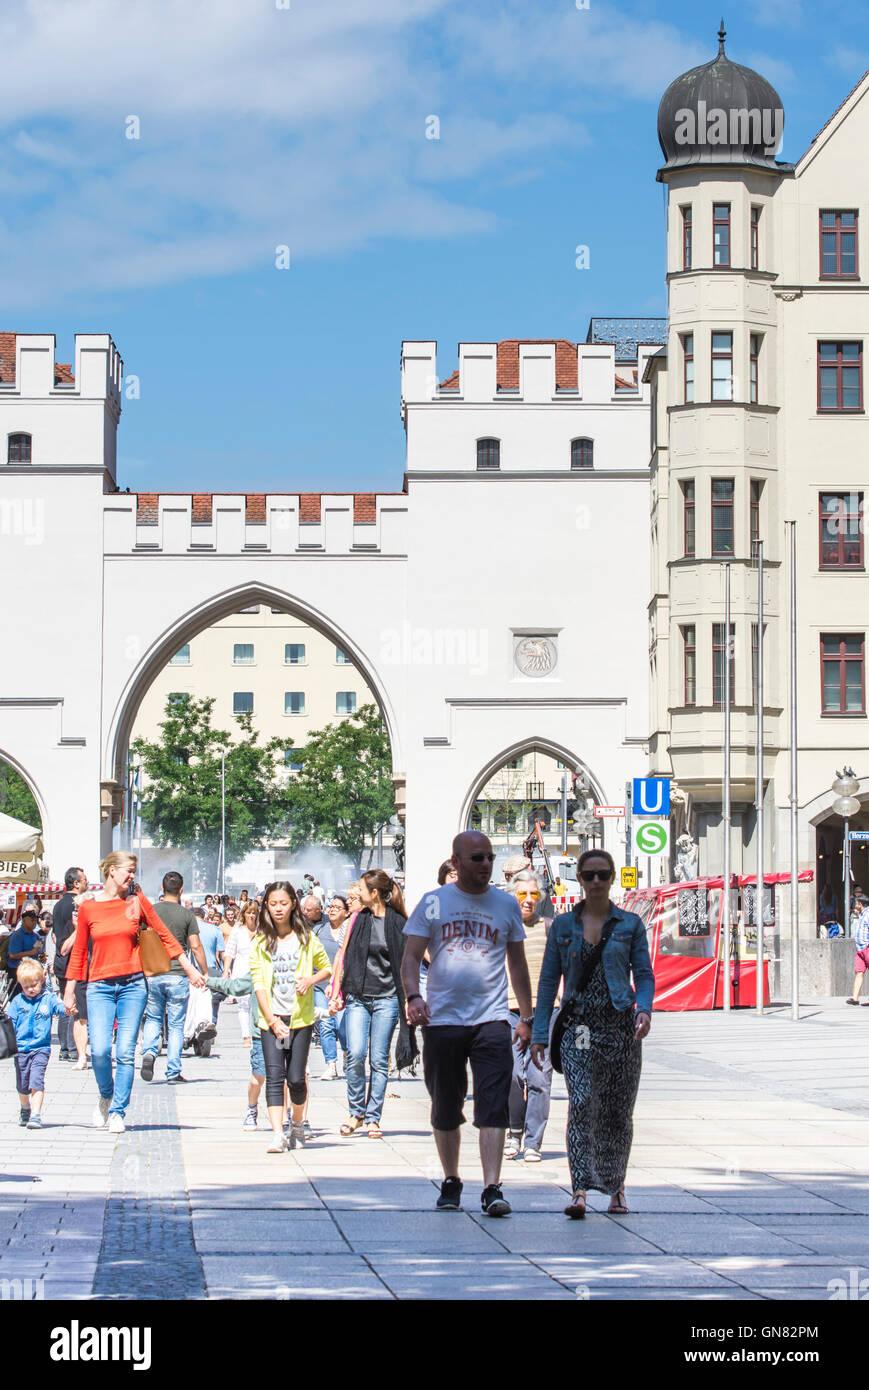 Los turistas en la zona peatonal de Munich Imagen De Stock